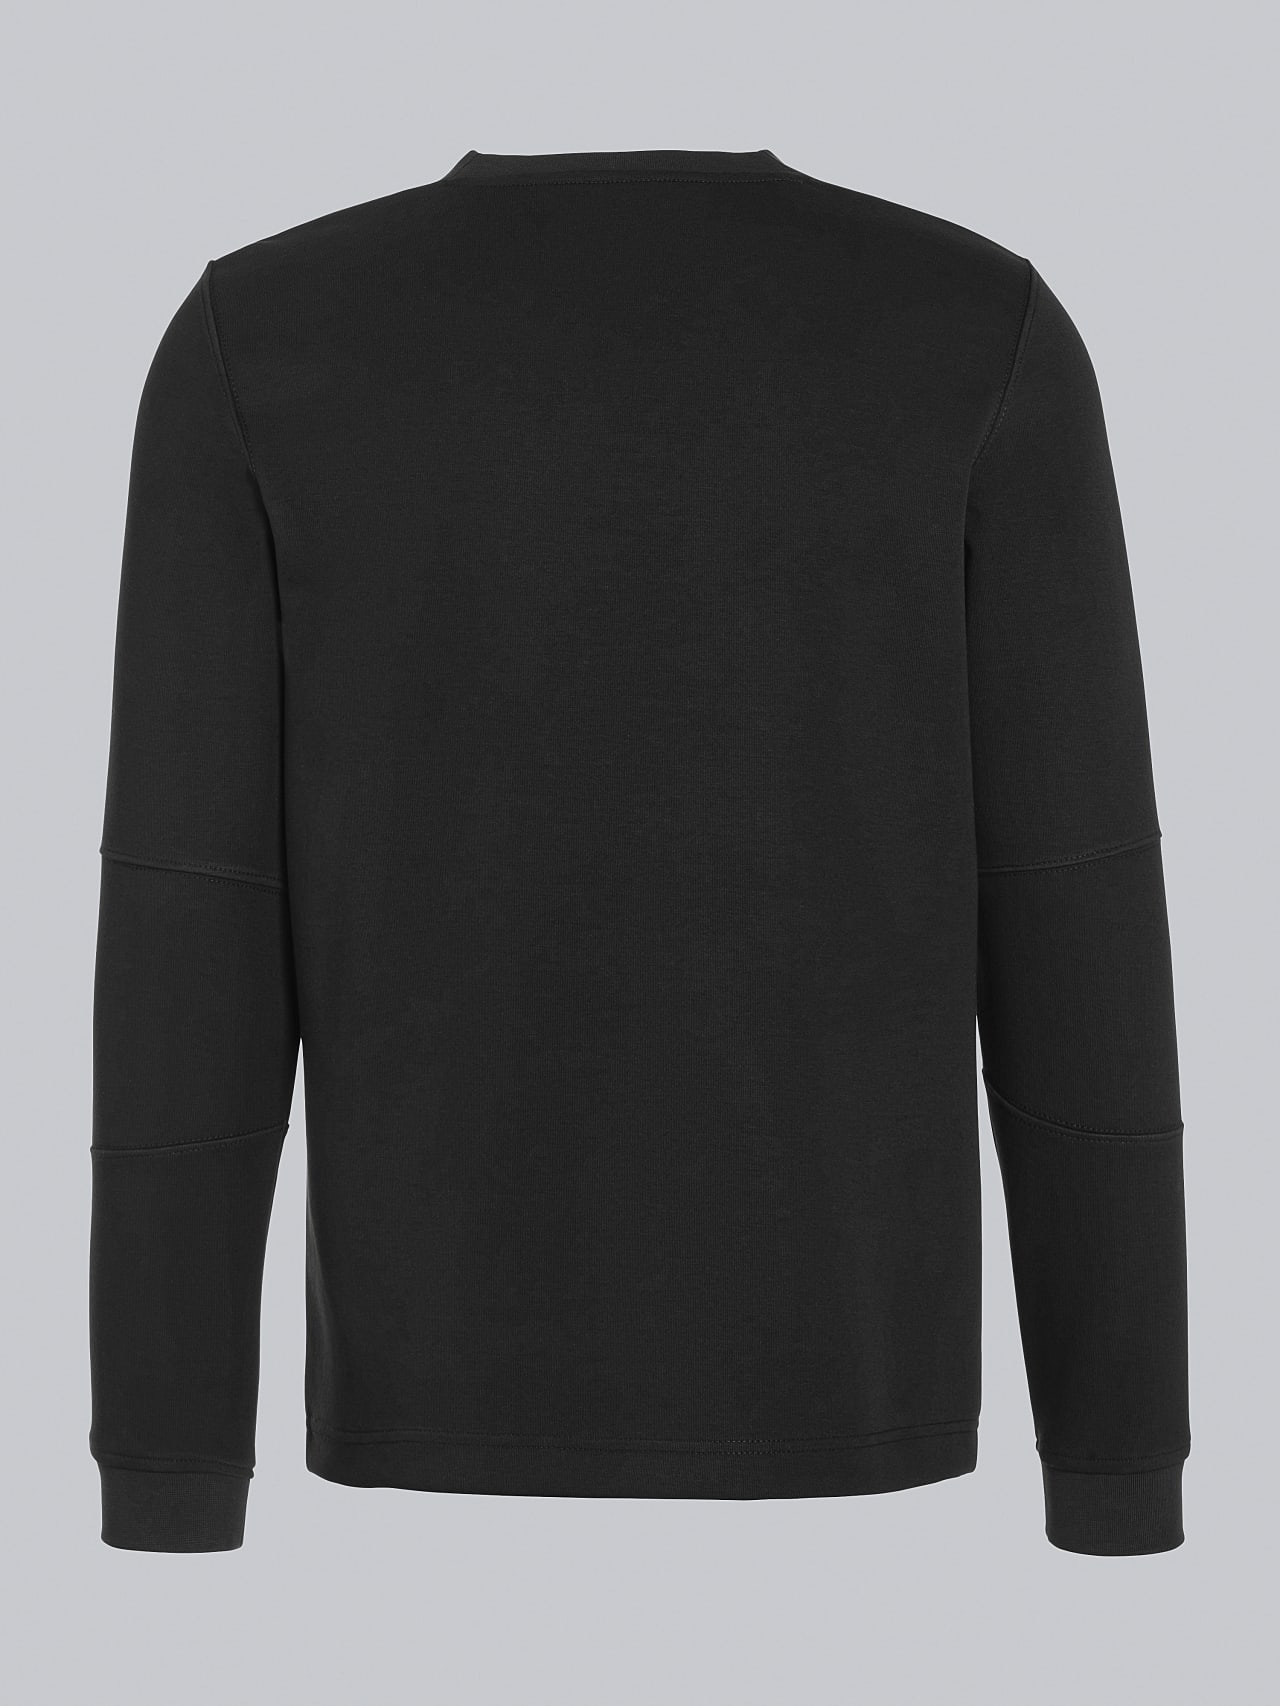 SCONA V1.Y5.02 Premium Sweatshirt black Left Alpha Tauri